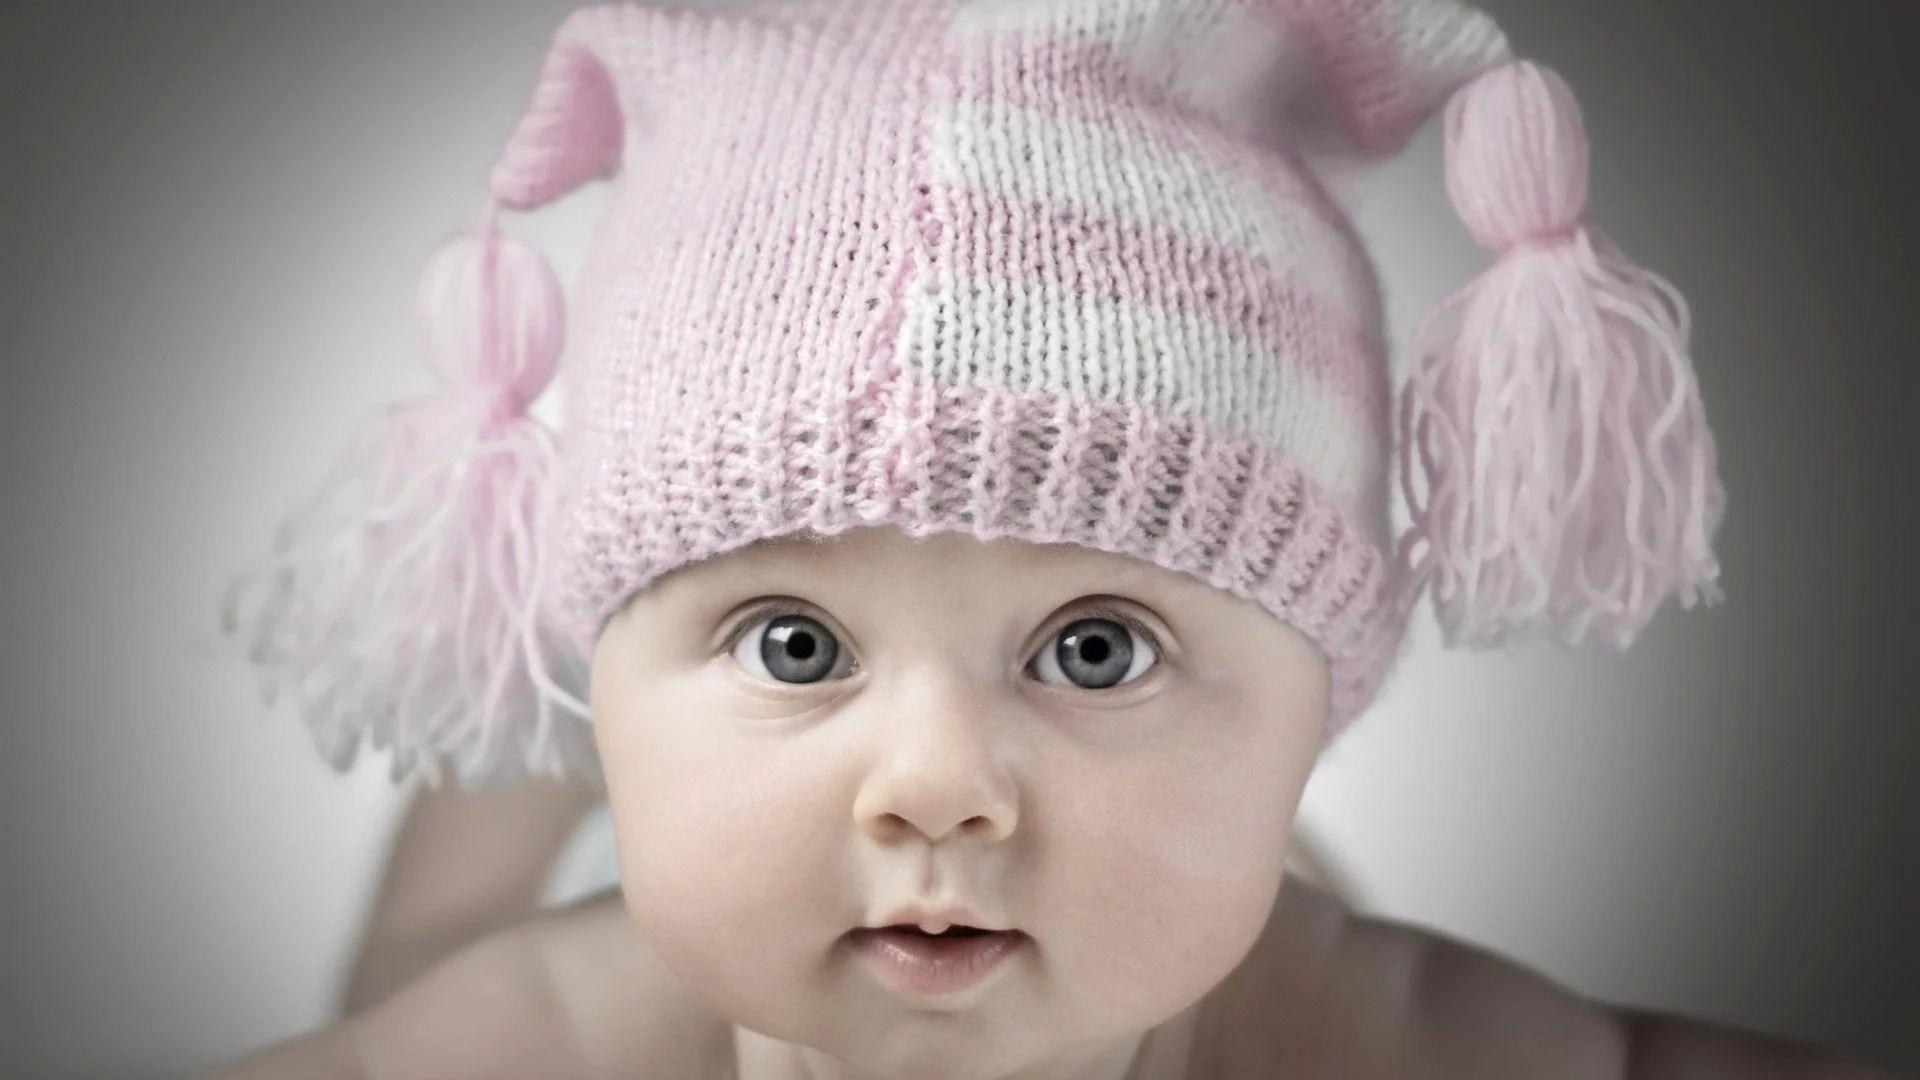 cute baby wallpapers wallpaper